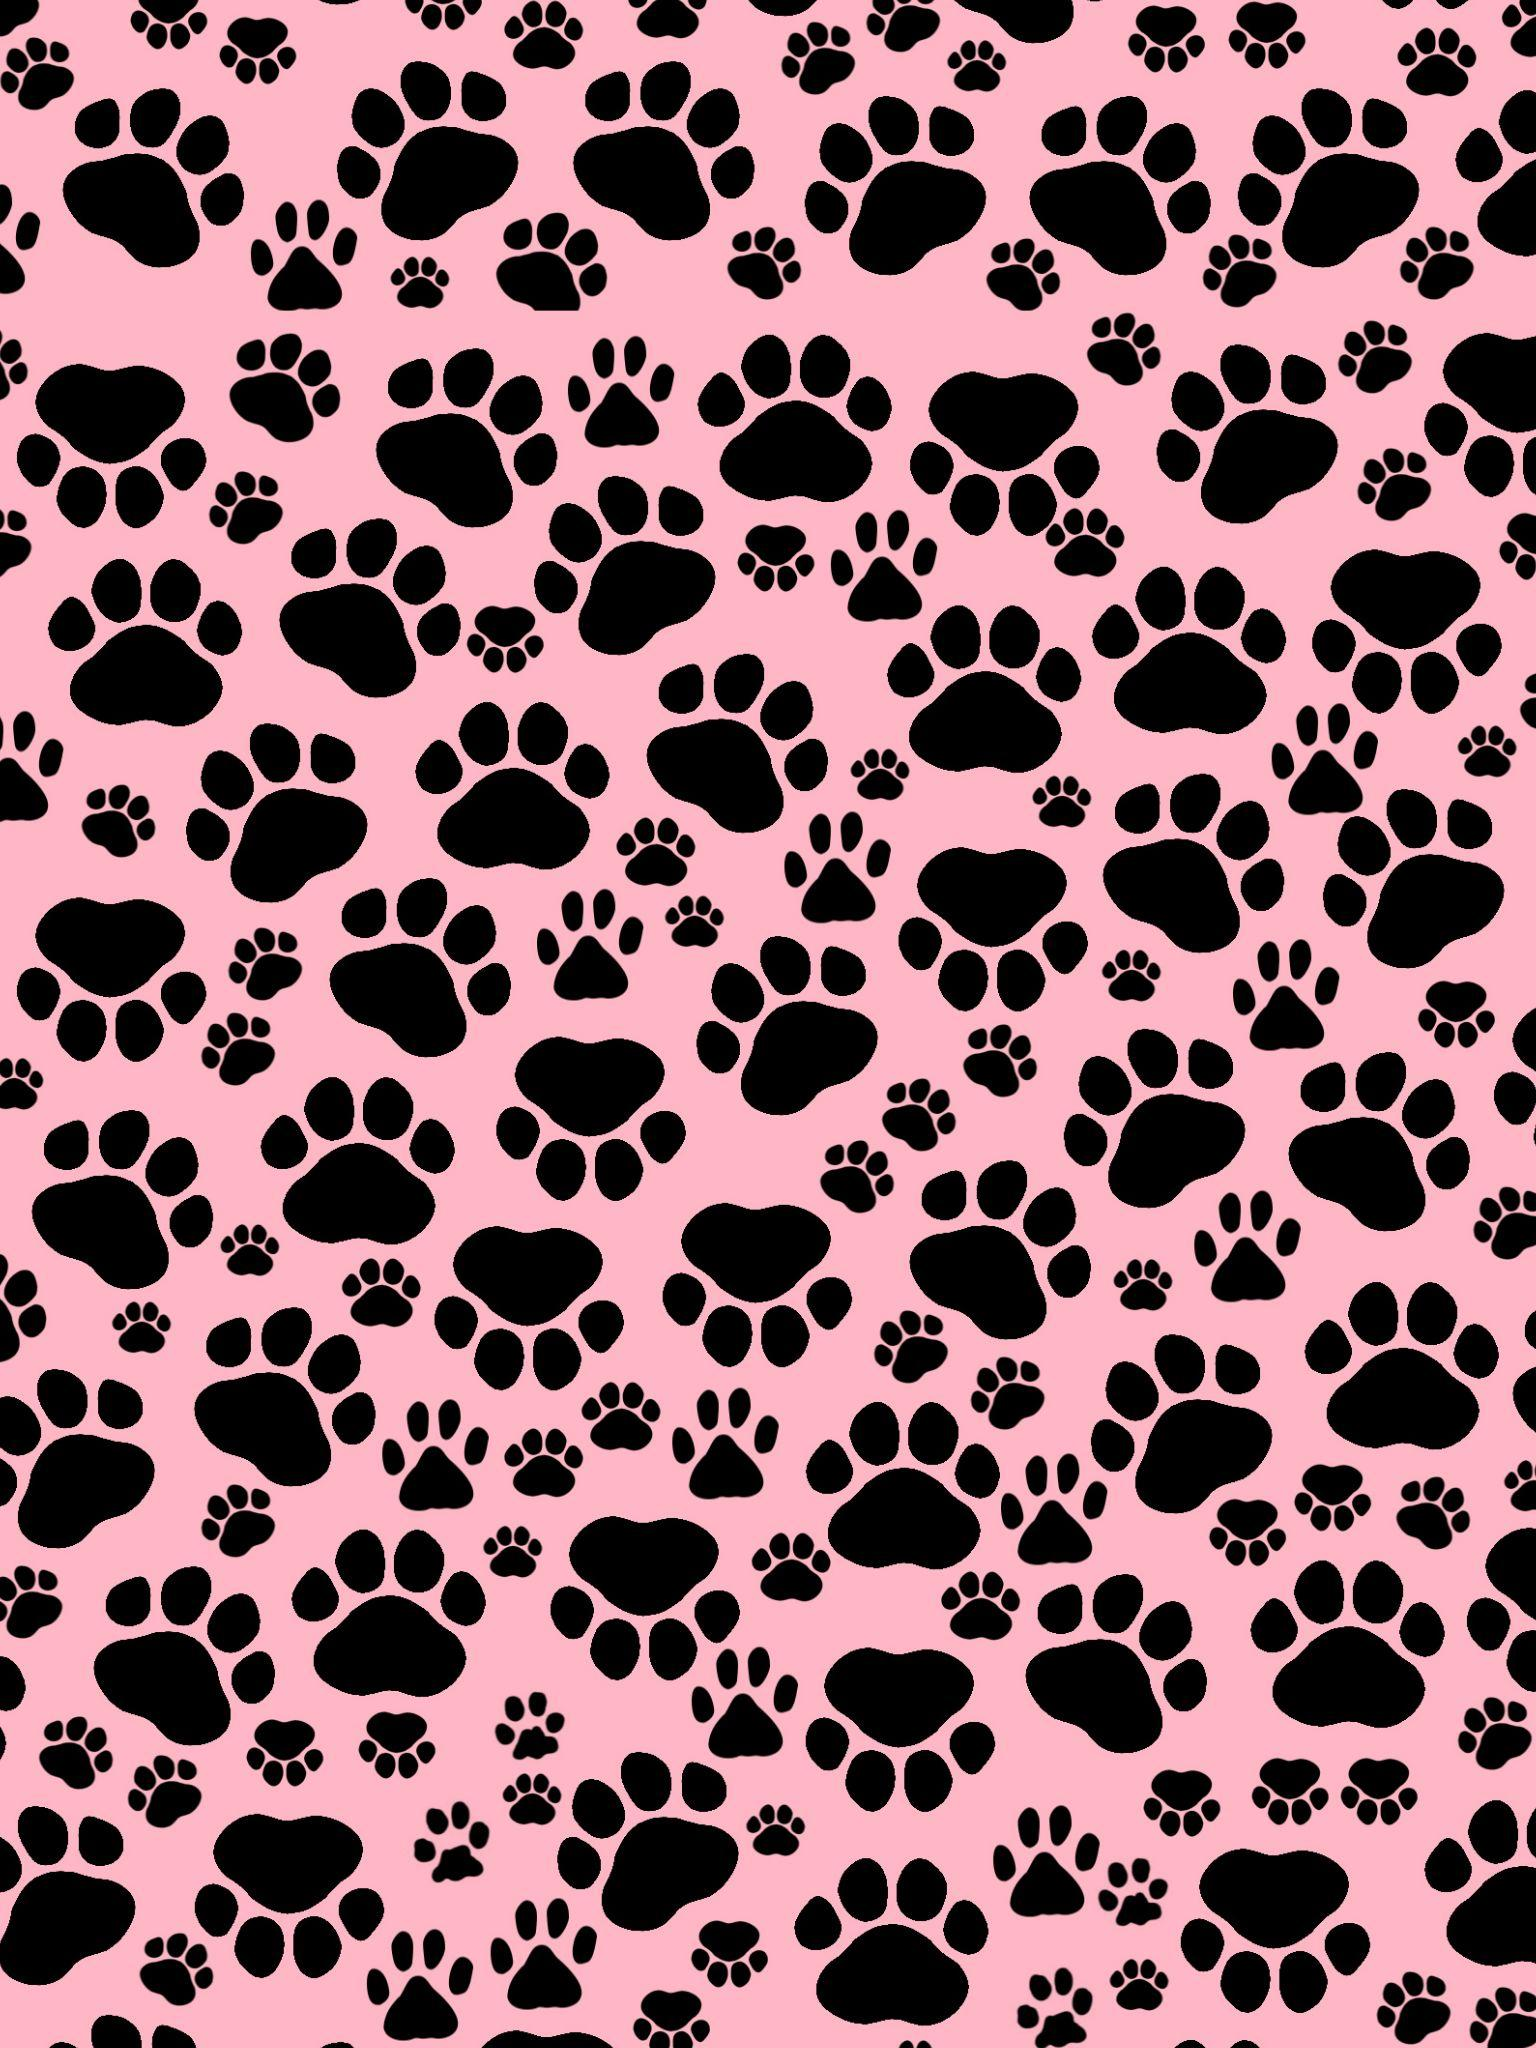 black and pink wallpaper Black And Pink Wallpapers   Wallpaper Cave black and pink wallpaper